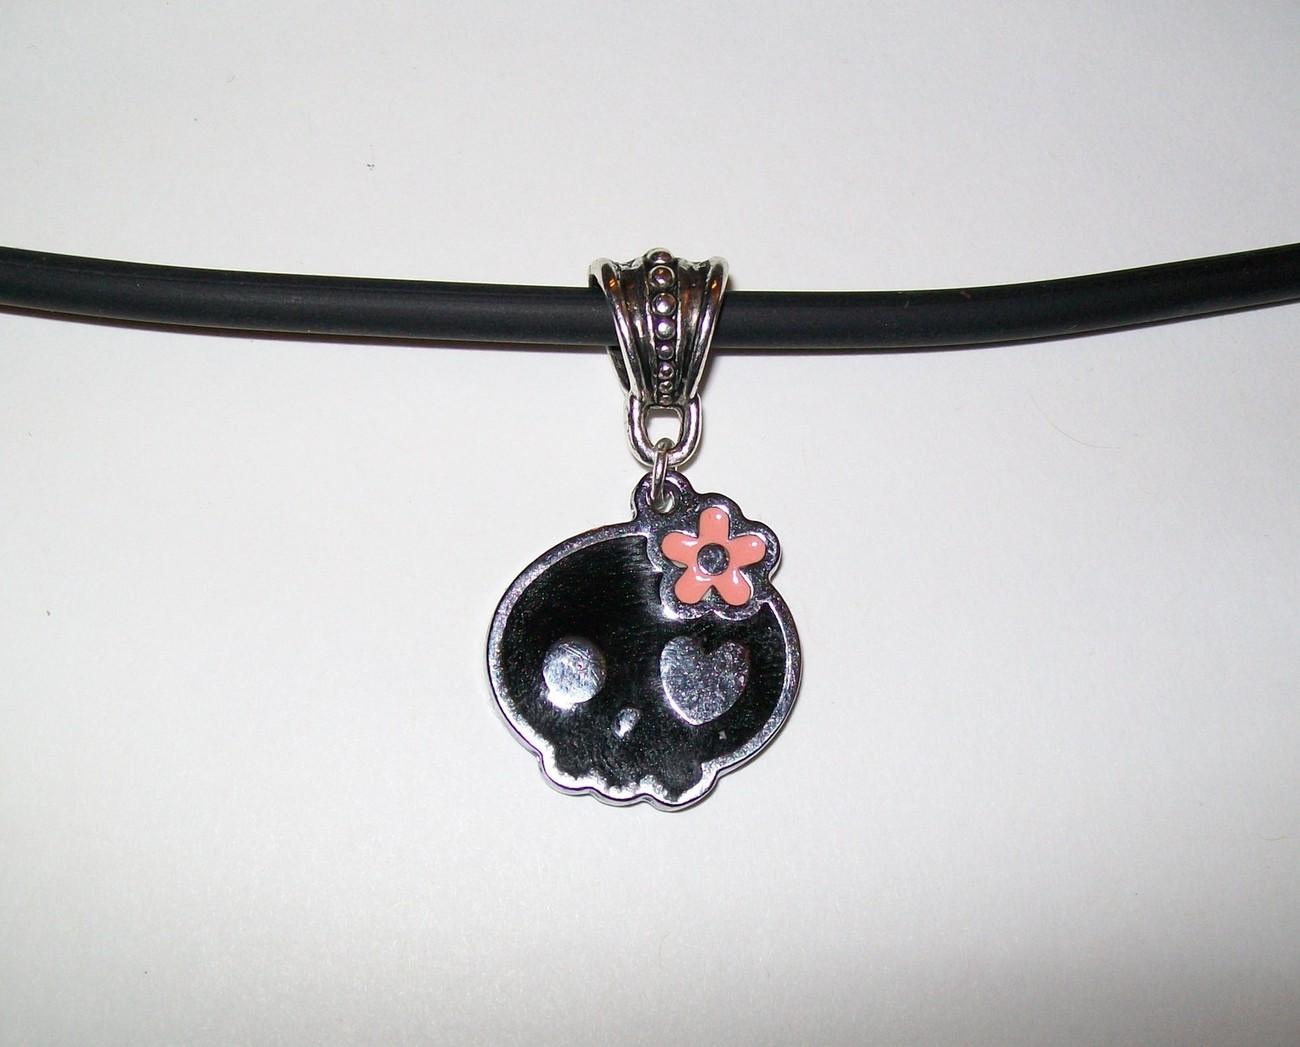 Sugar Skull Necklace or Earrings